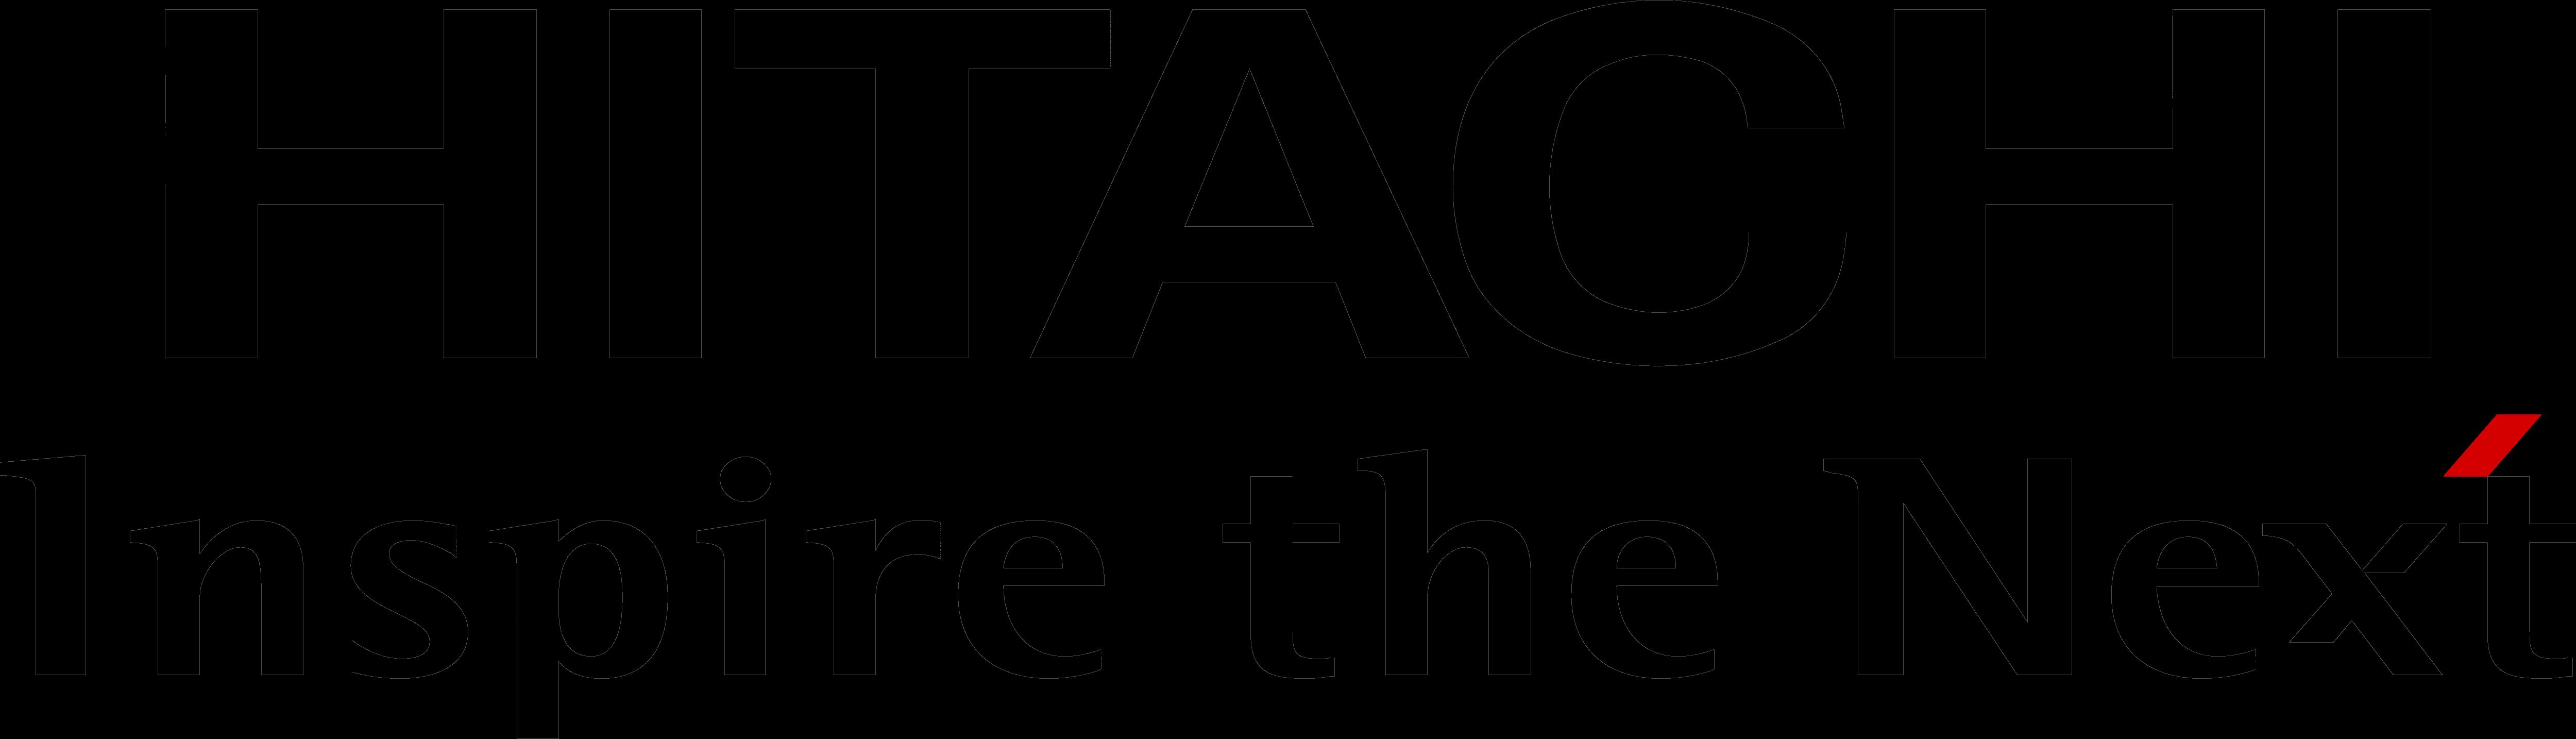 Hitachi logo logotype black